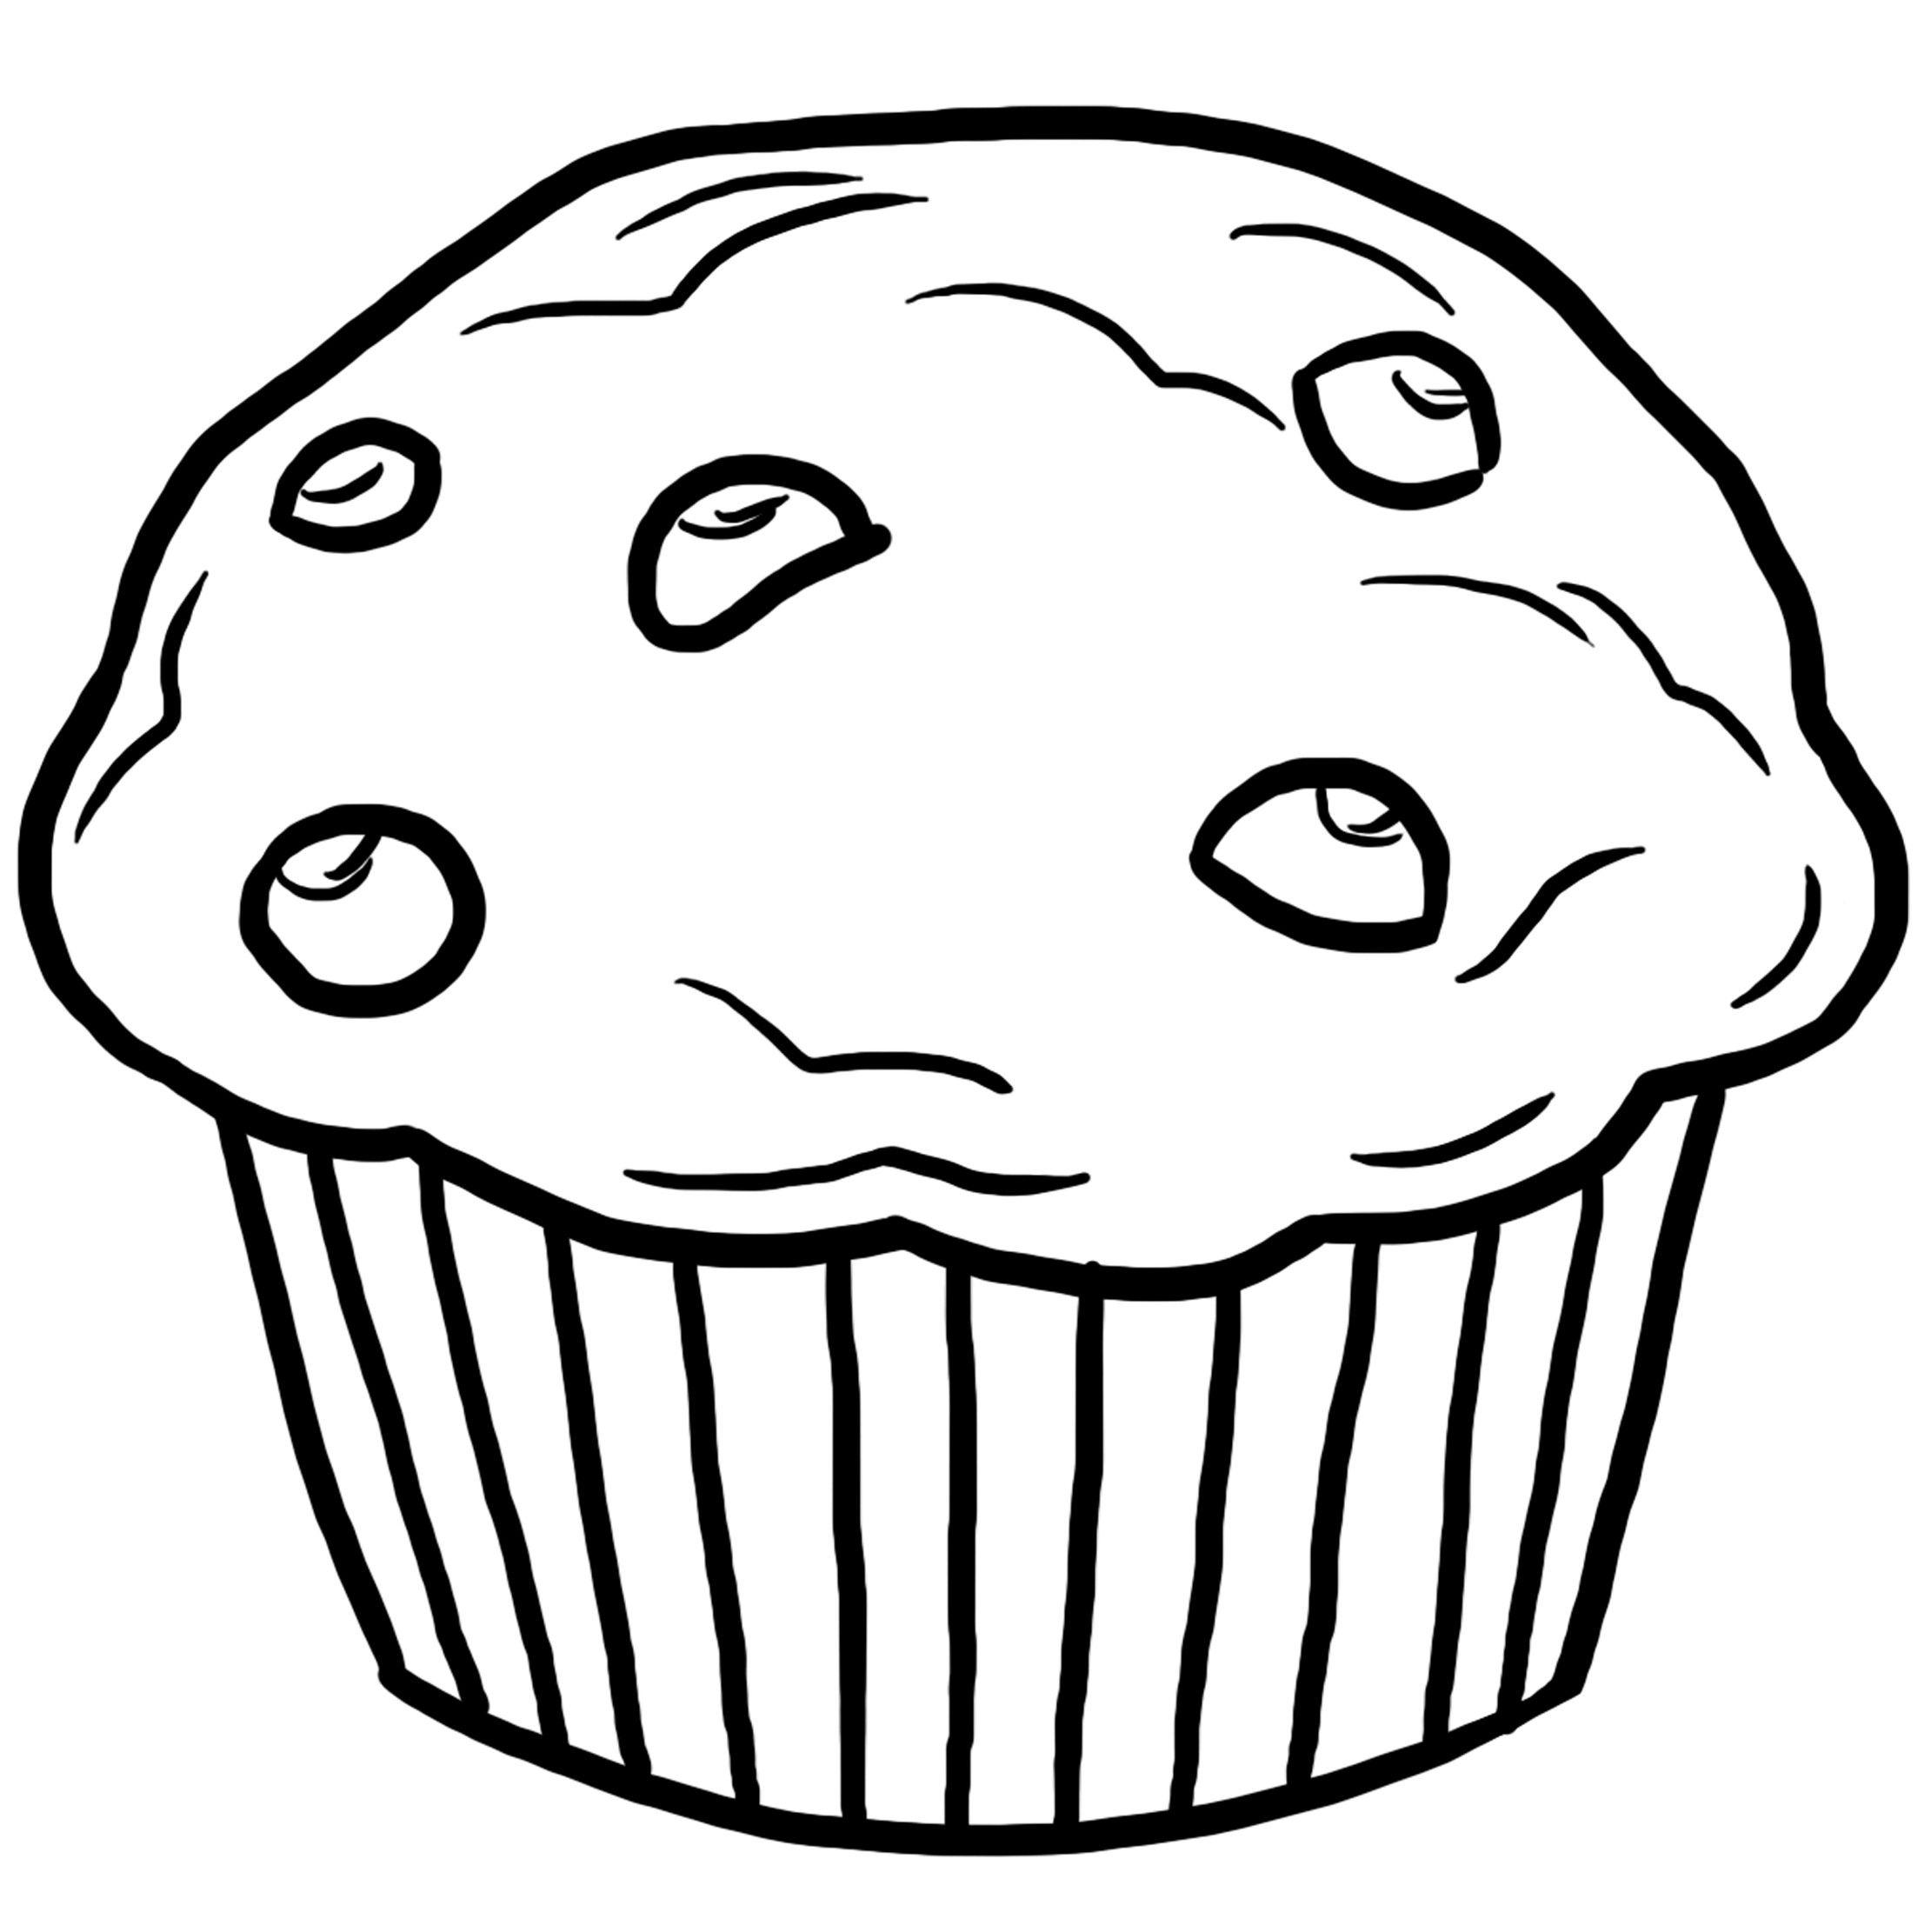 Muffin, Dessin à colorier, coloriage, printable, PDF, jeu